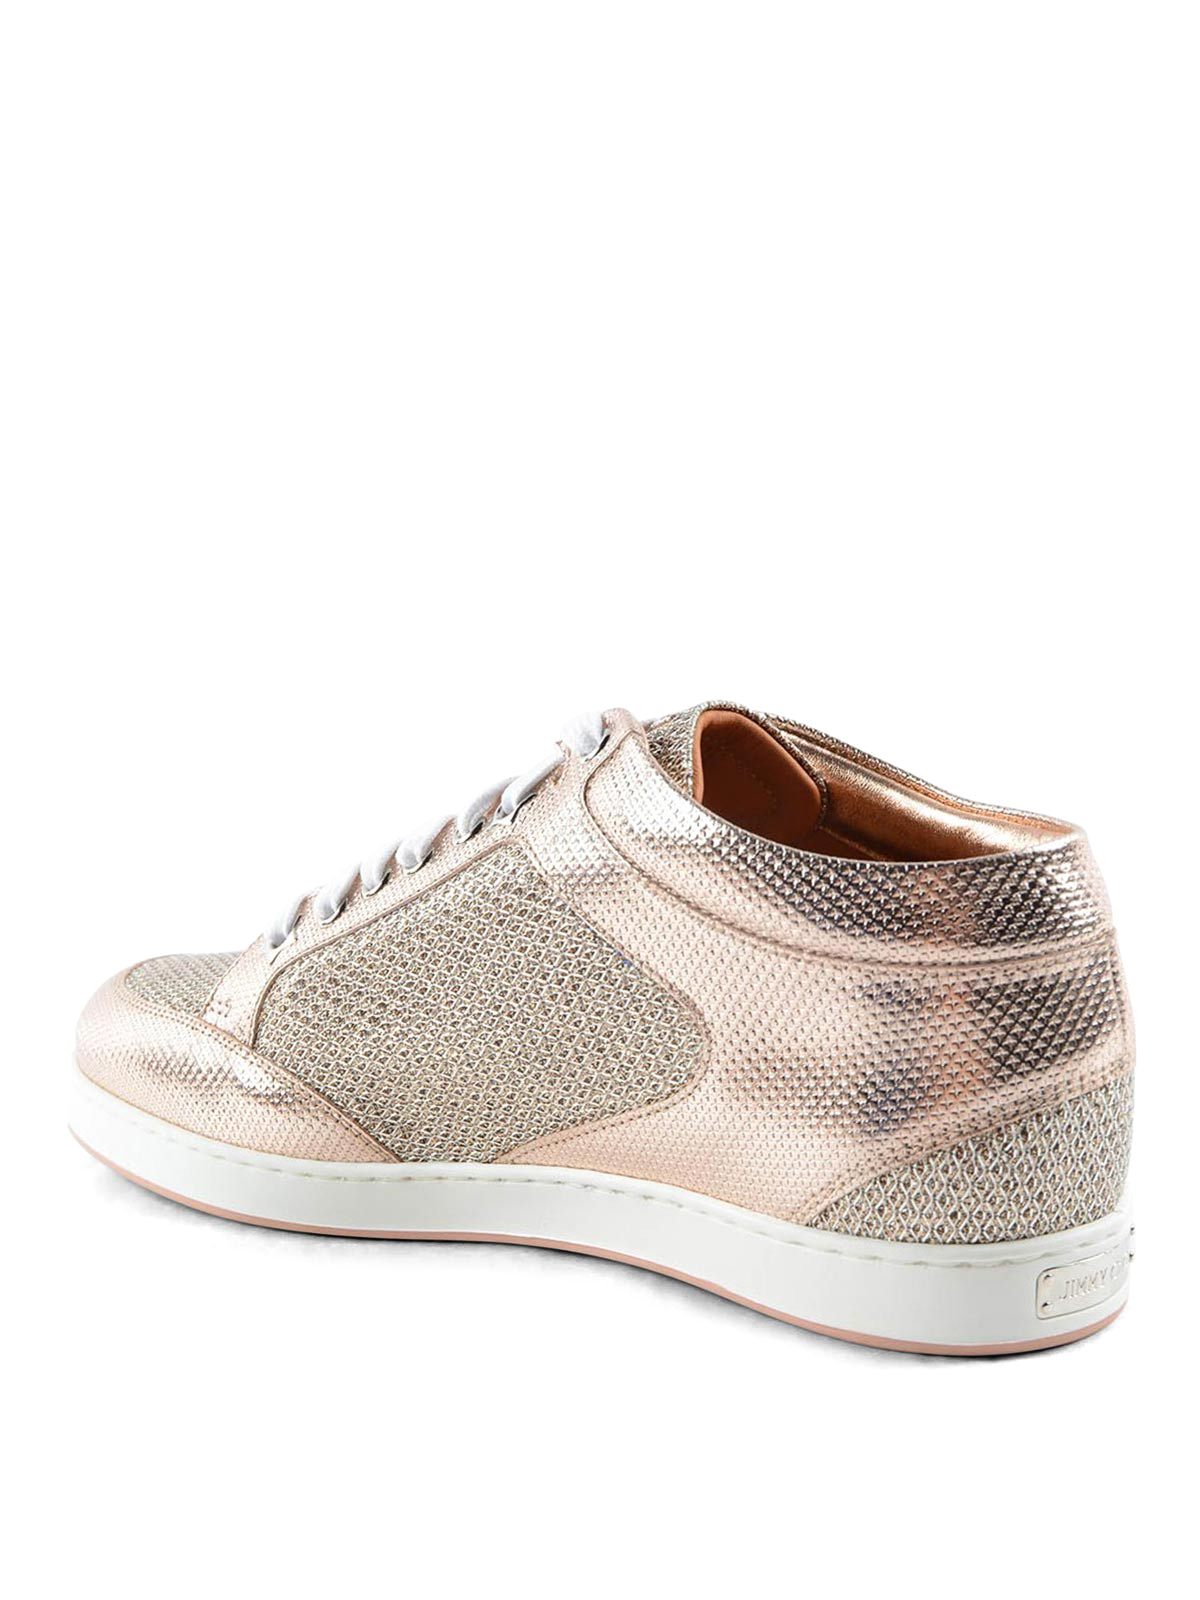 Jimmy Choo Miami Metallic And Glitter Sneakers